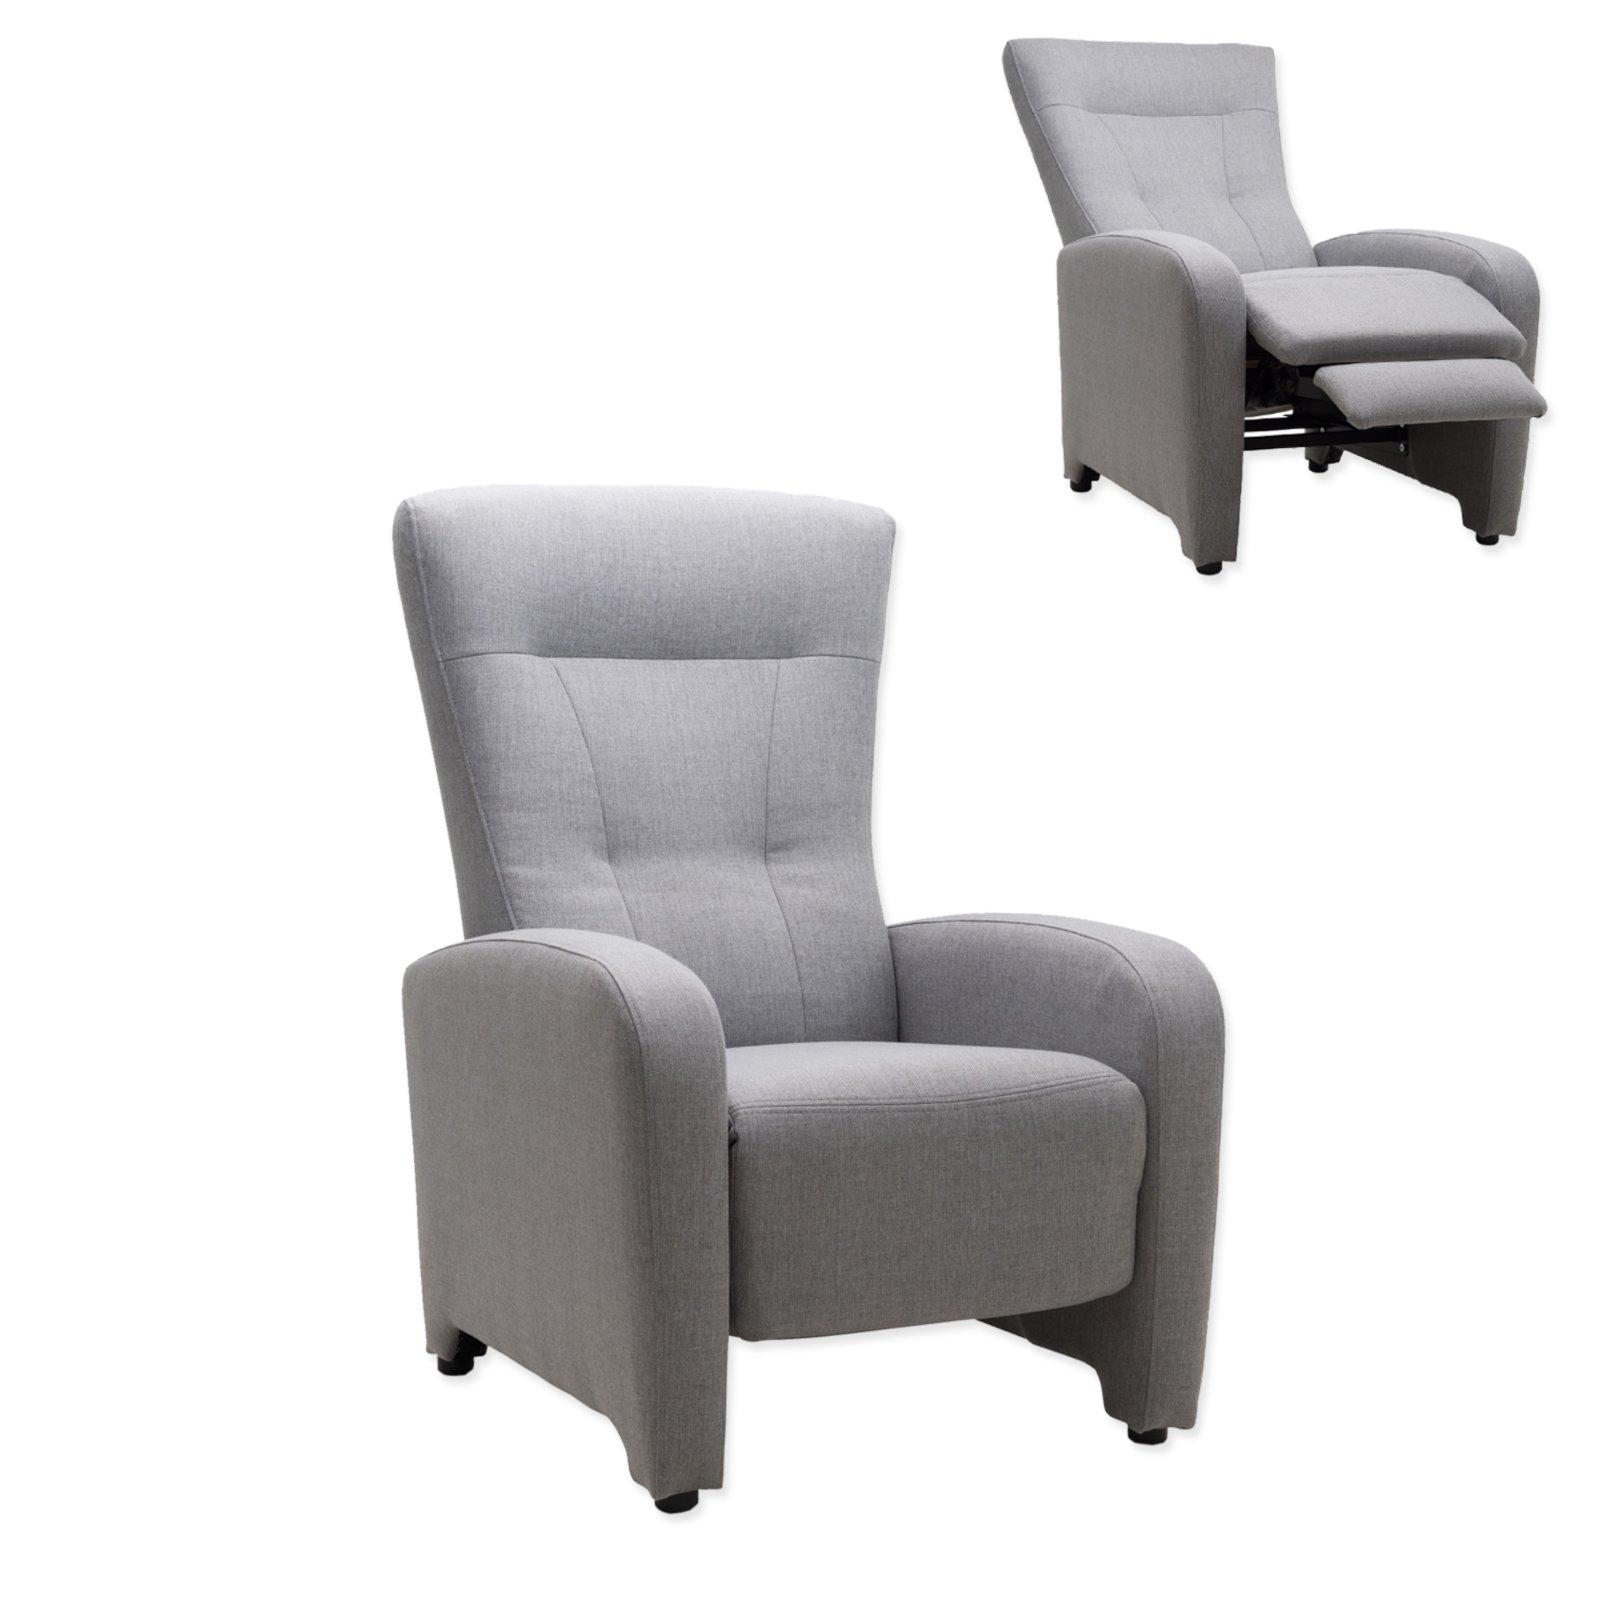 TV-Sessel - grau - mit Funktion | Fernseh- & Relaxsessel | Sessel ...